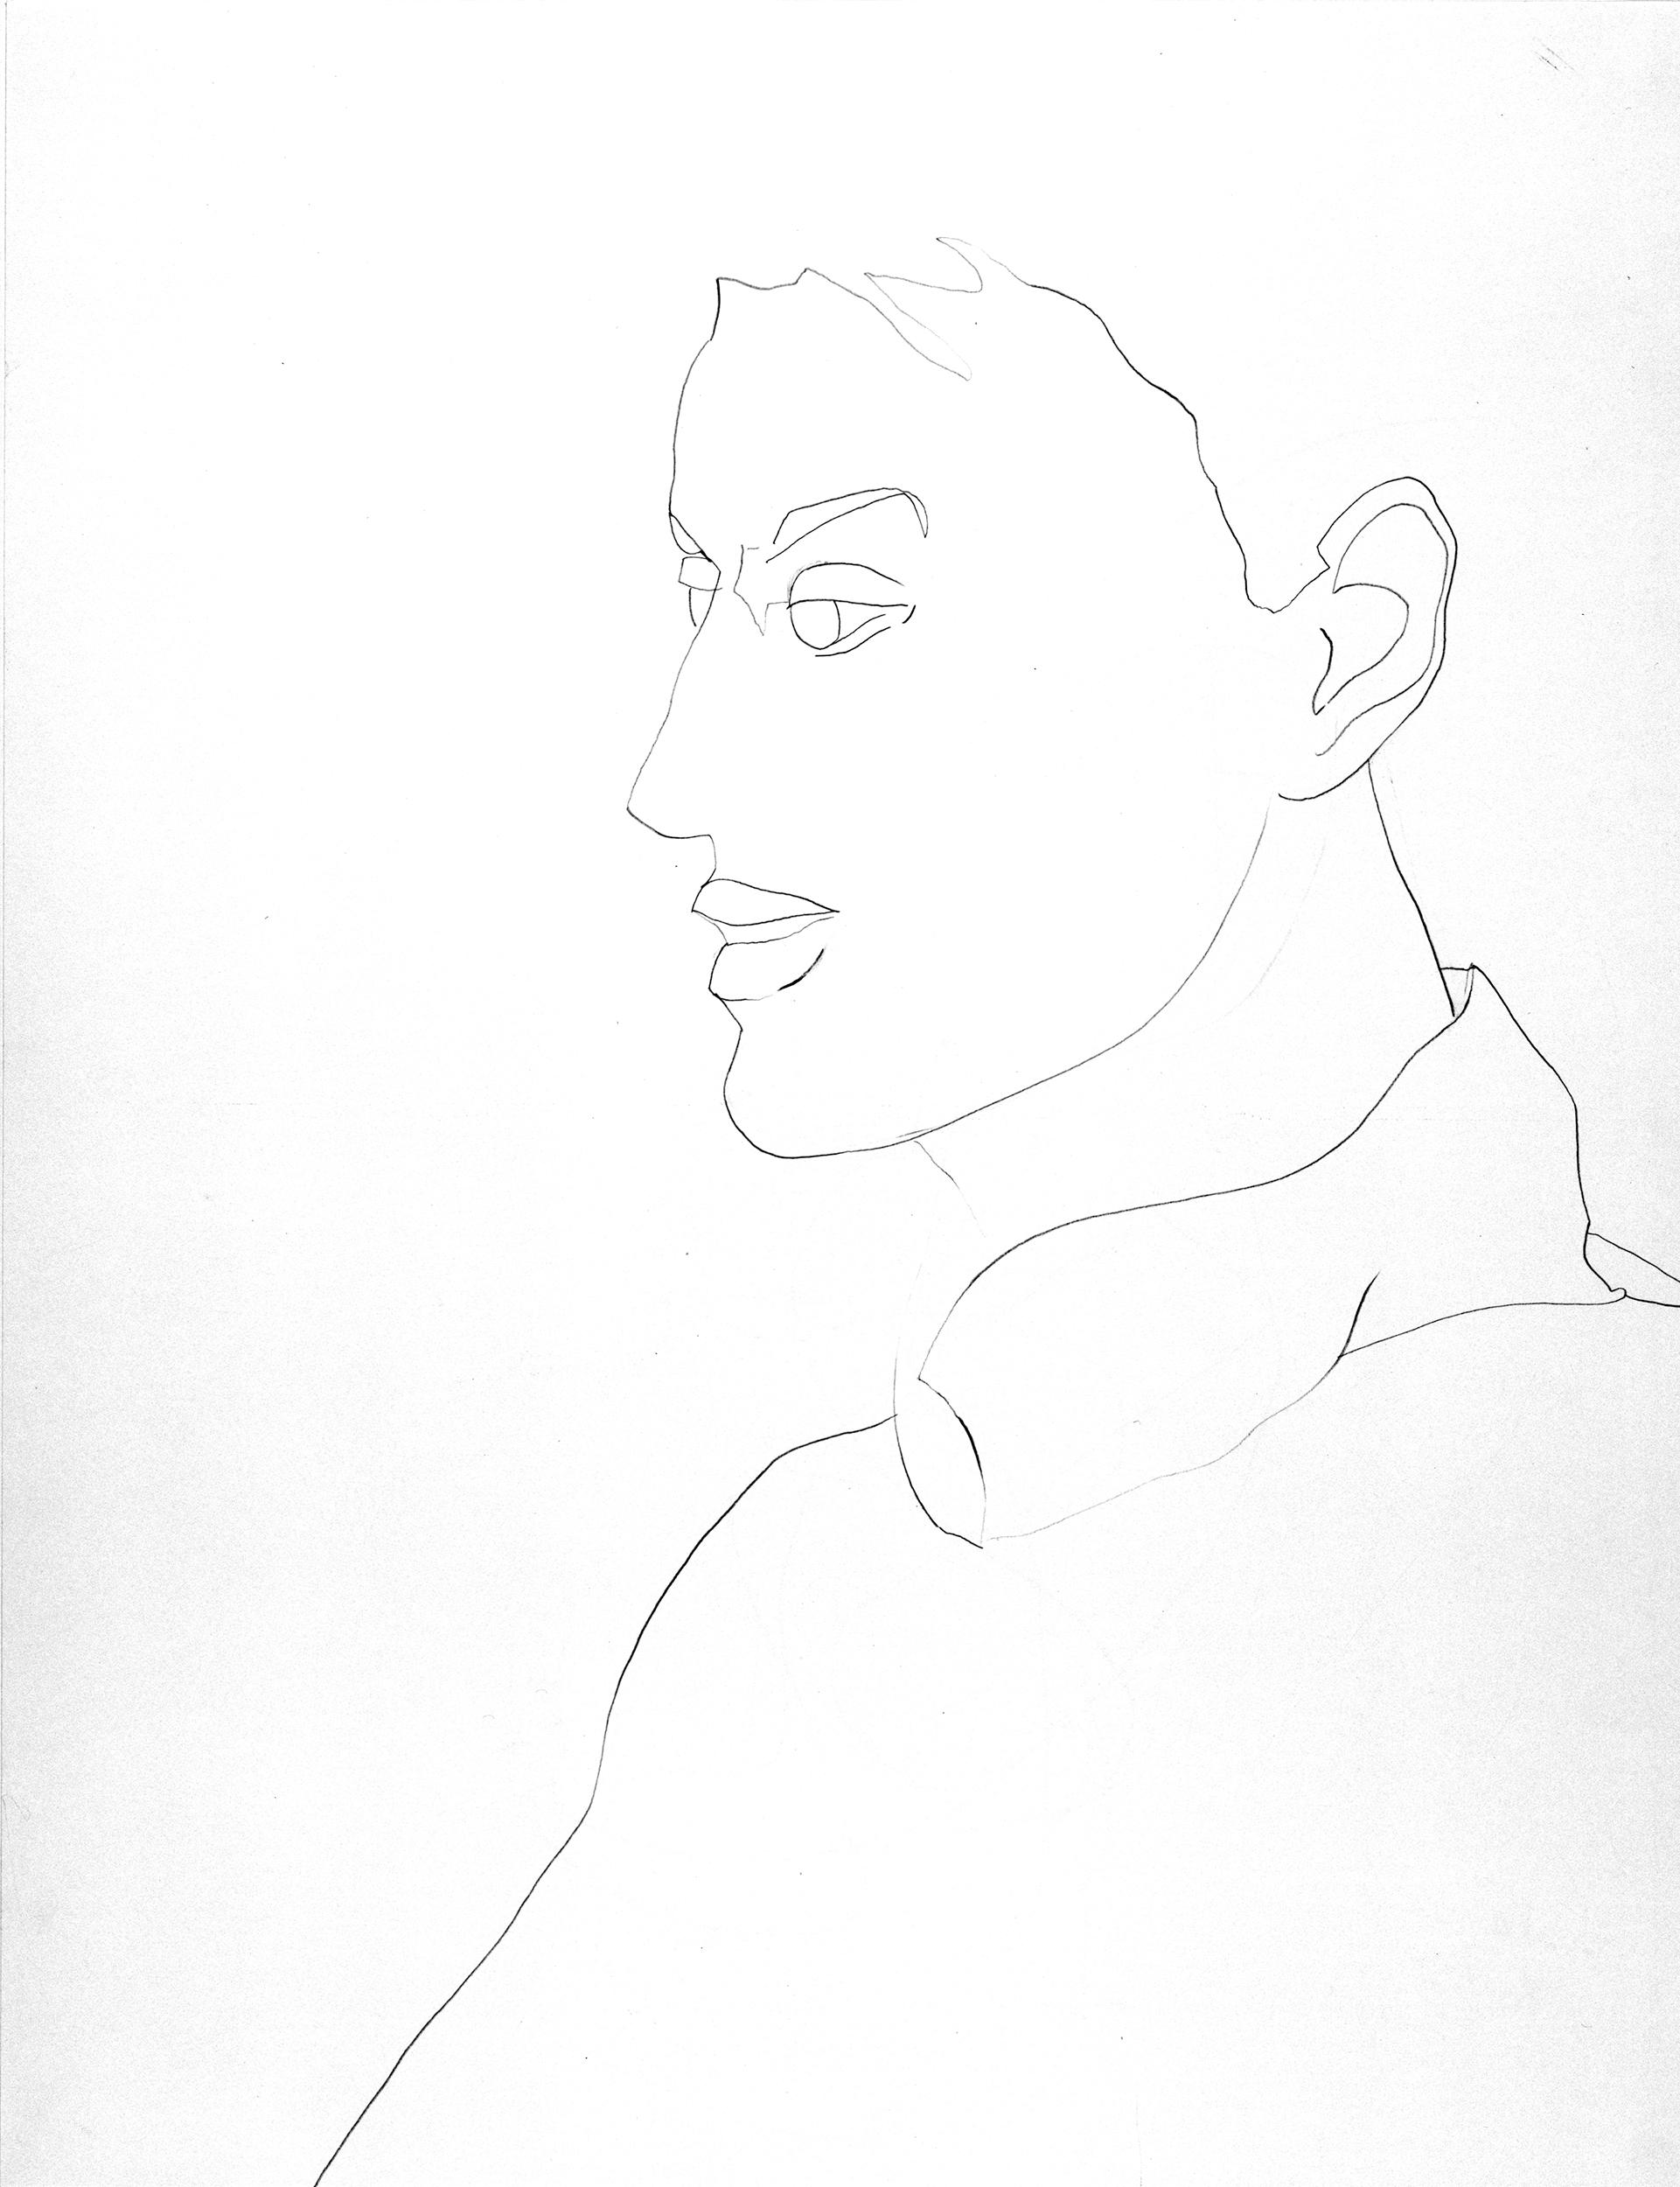 Self-portrait (profile), drawing by Wouter van Riessen